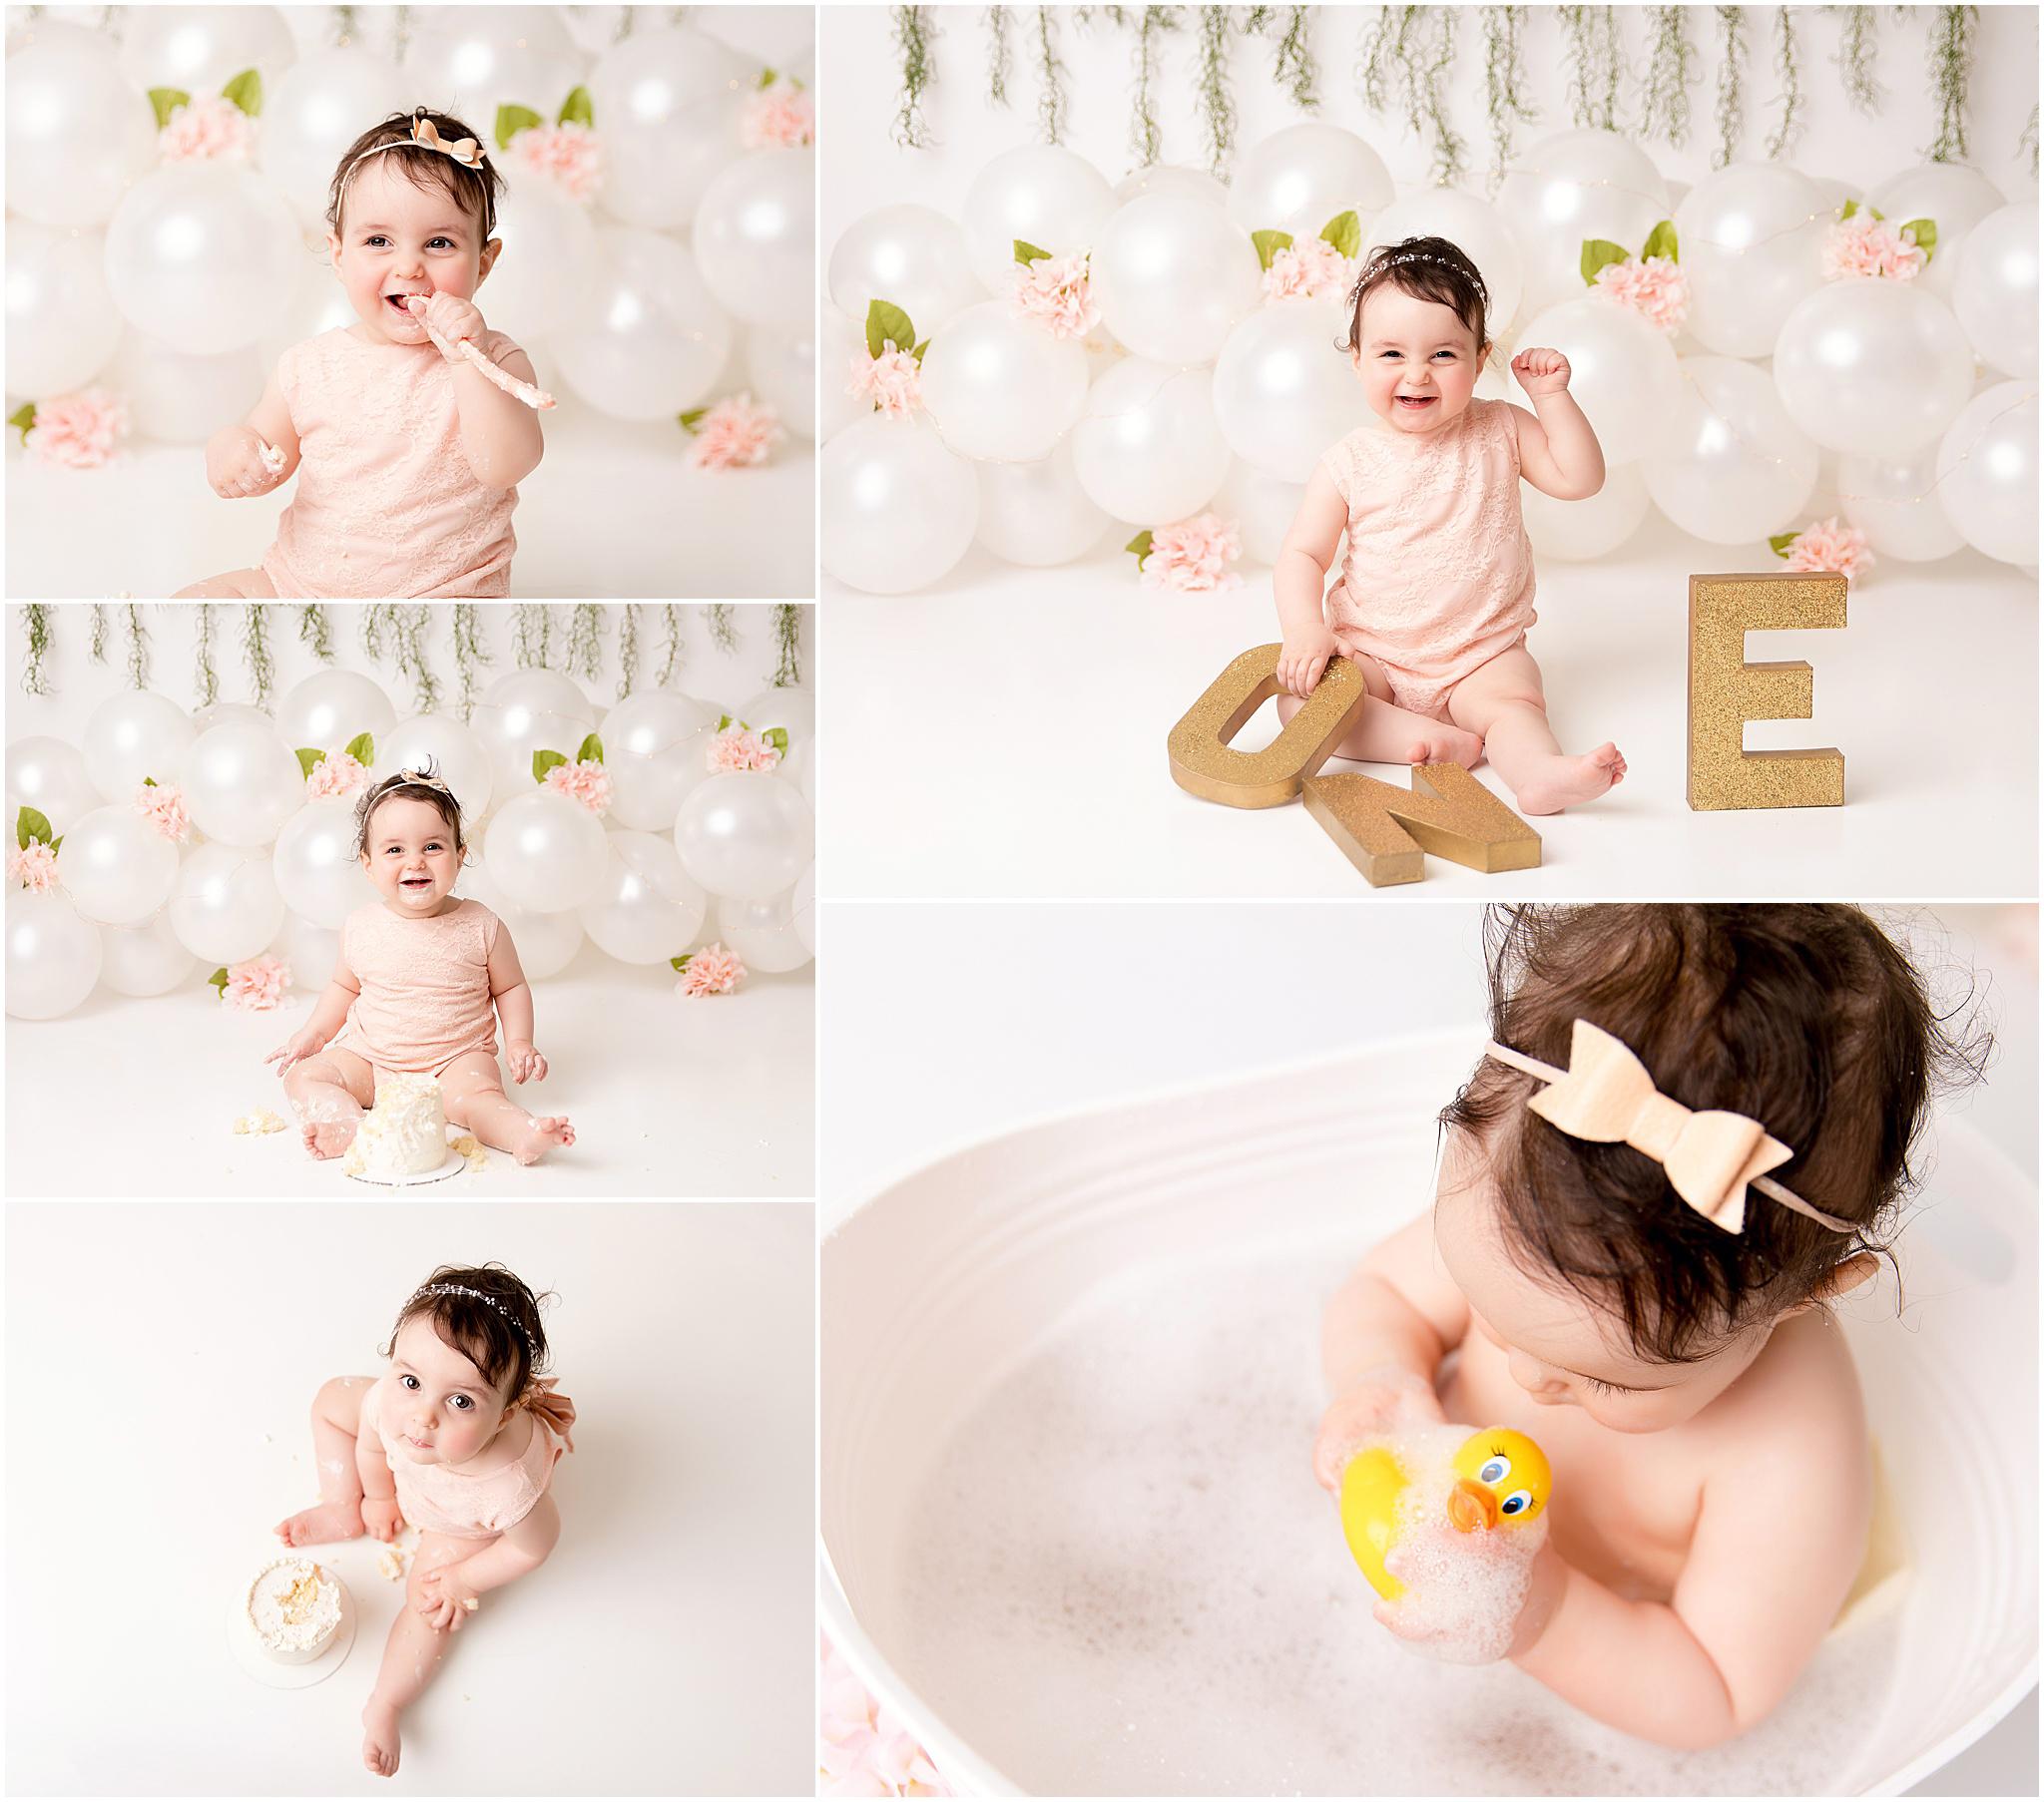 cakesmash+photography+Luciana+Golcman+NYC+37.jpg